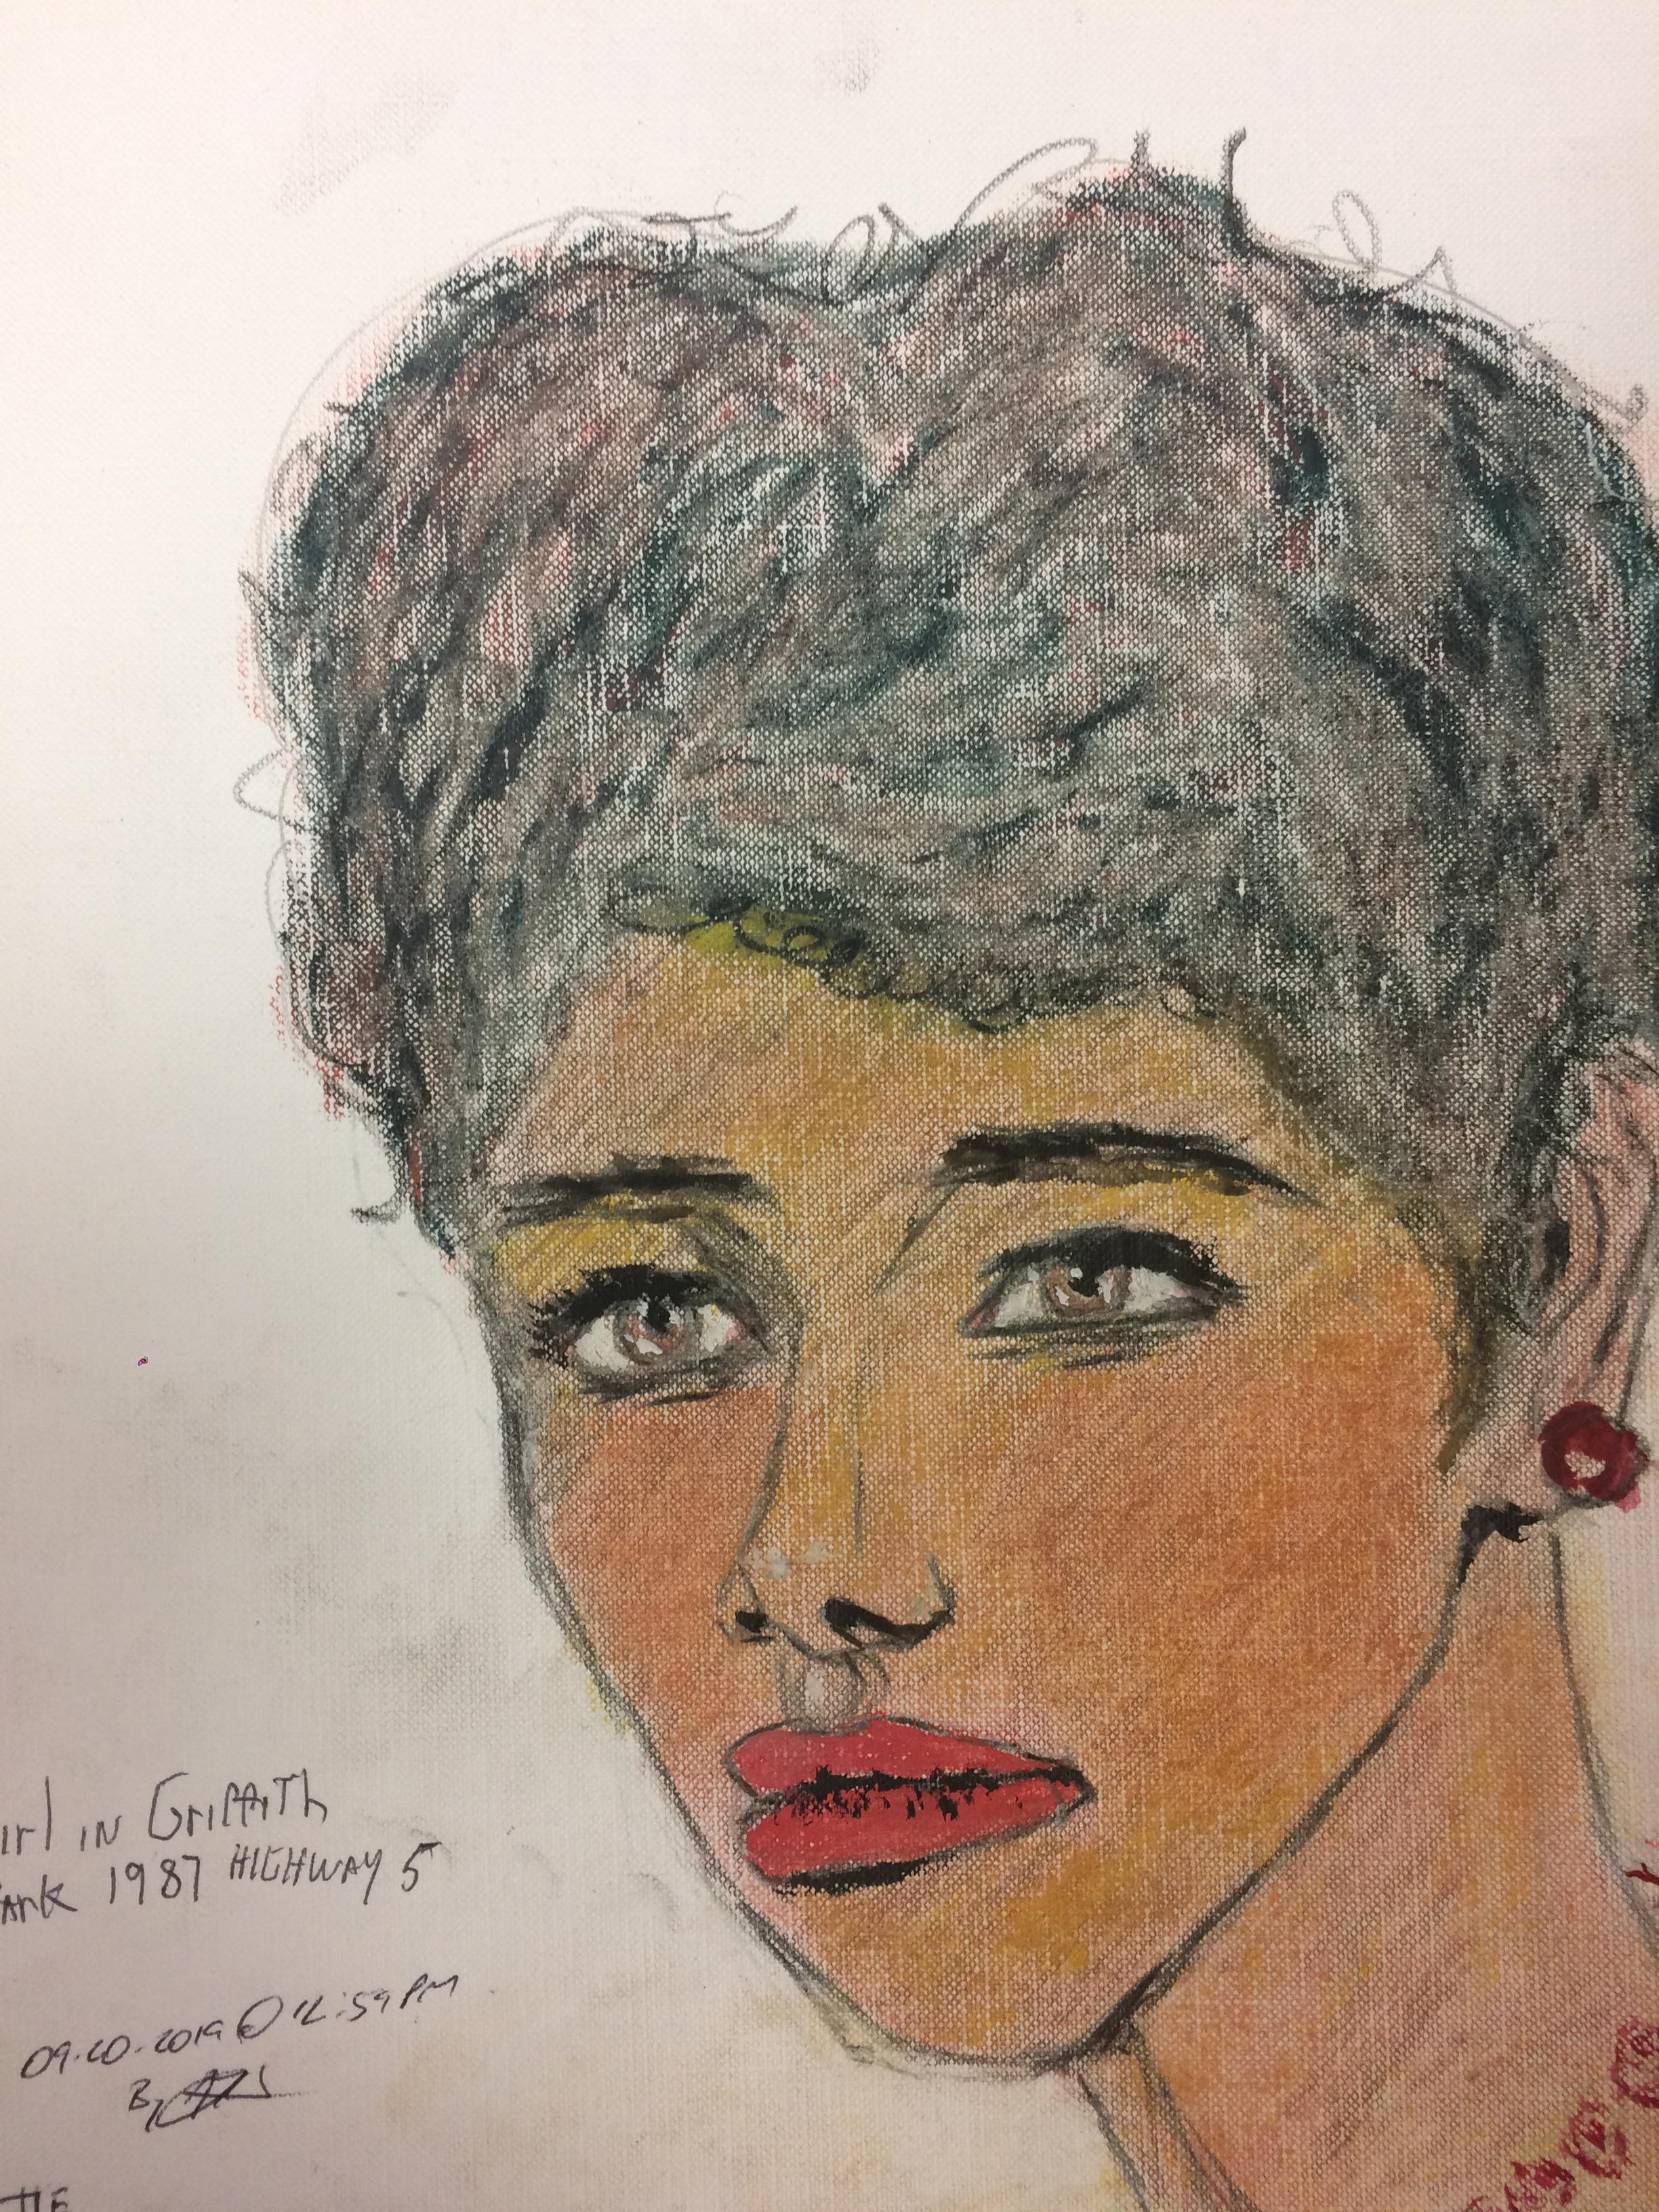 Samuel Little Drawing of Black Female Victim (Killed in 1987, Los Angeles)